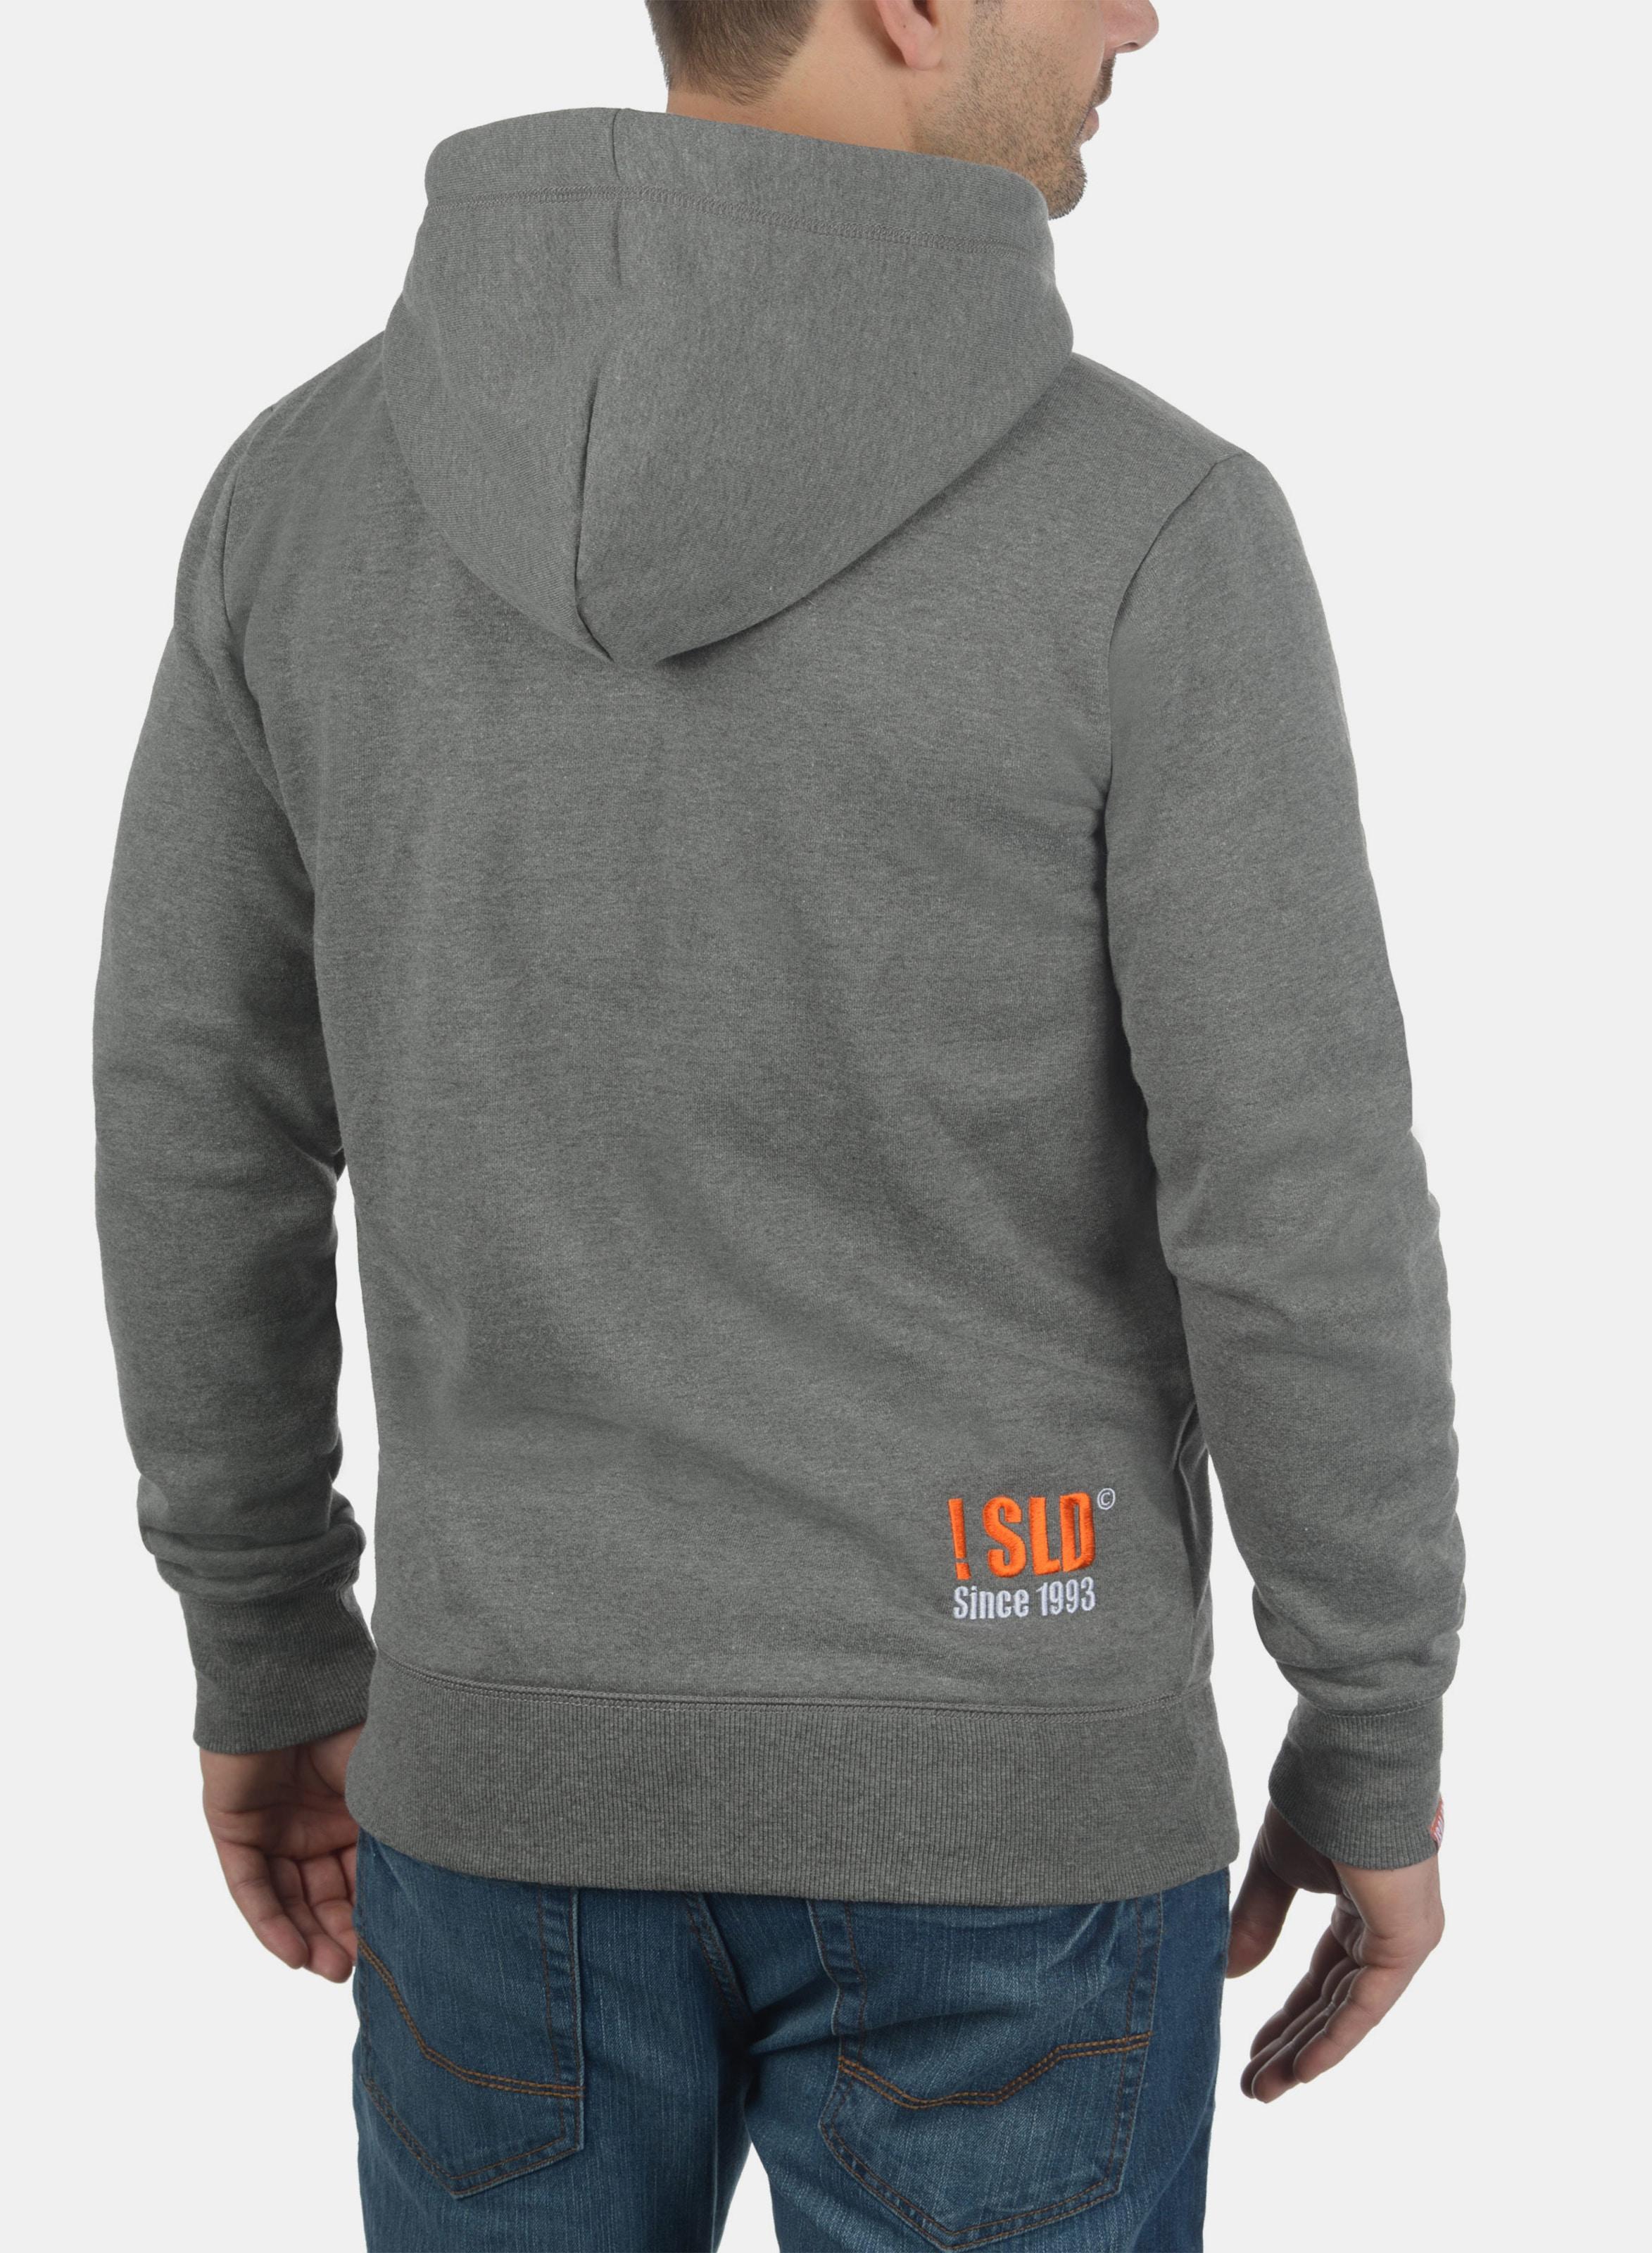 Kapuzensweatjacke 'benn Weiß High neck' In GrauOrange solid n0kPO8w